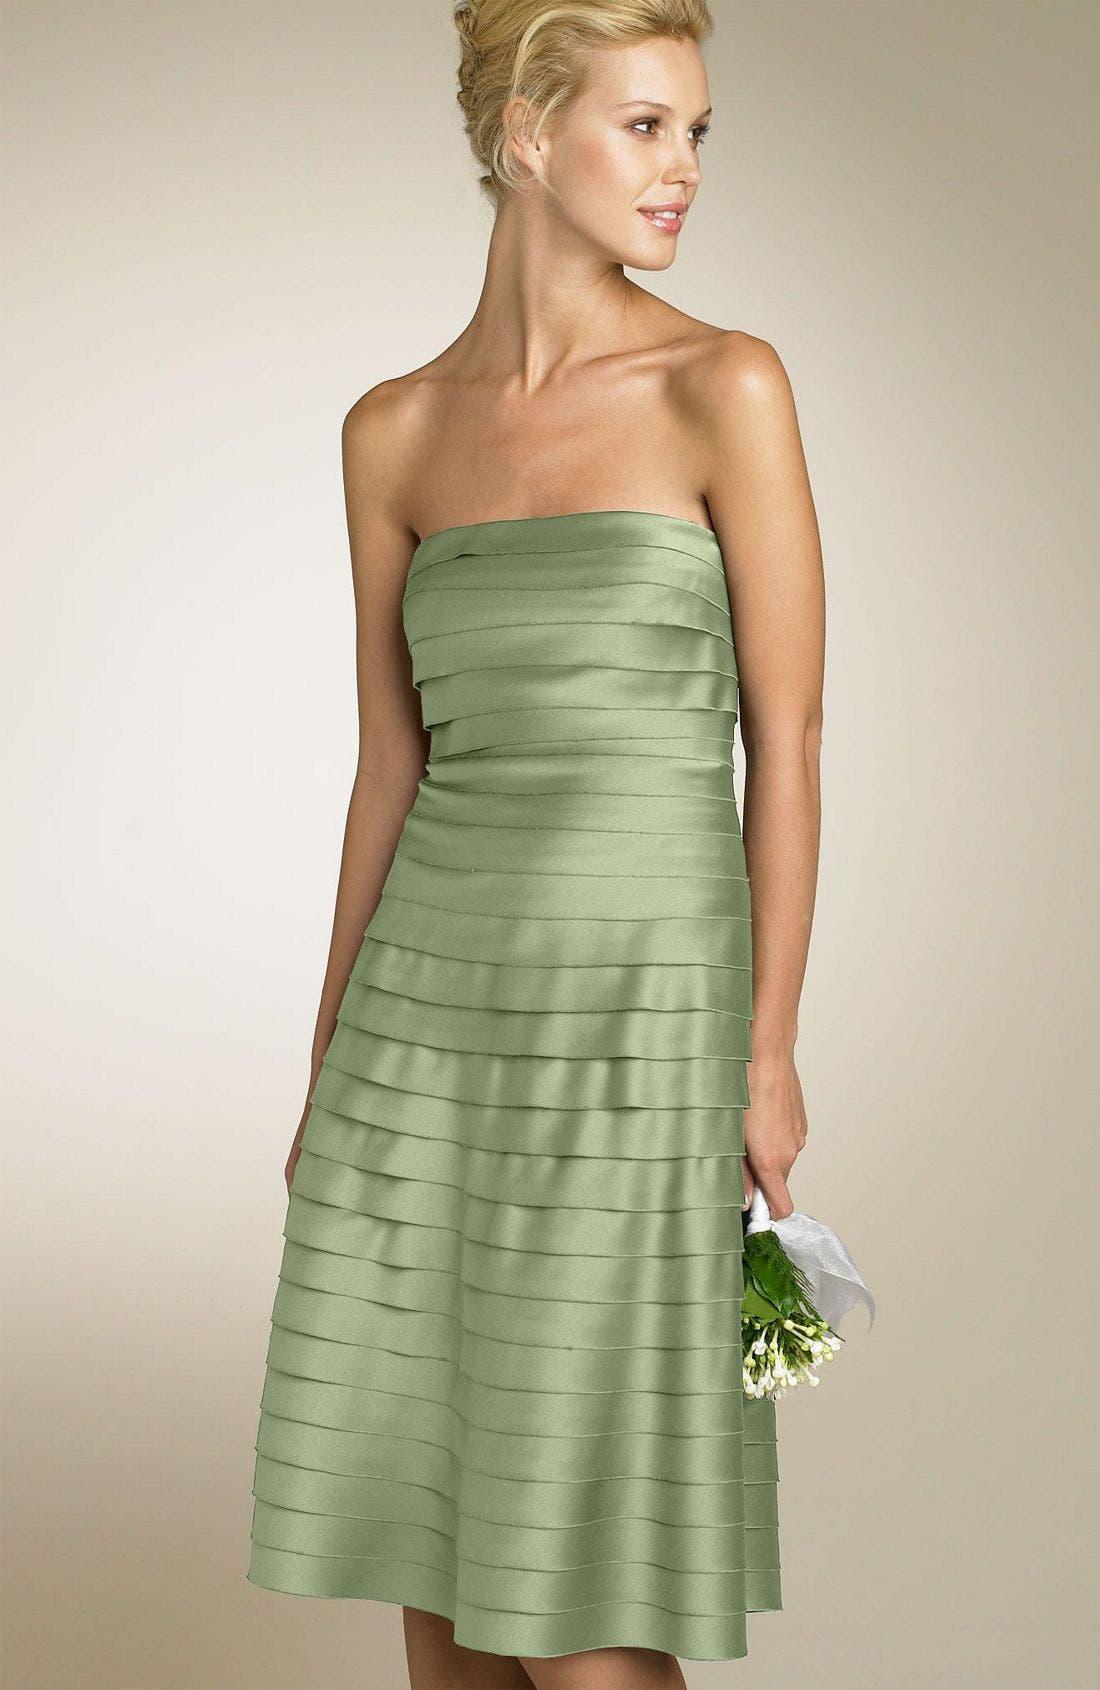 Alternate Image 1 Selected - Eliza J Strapless Satin Party Dress